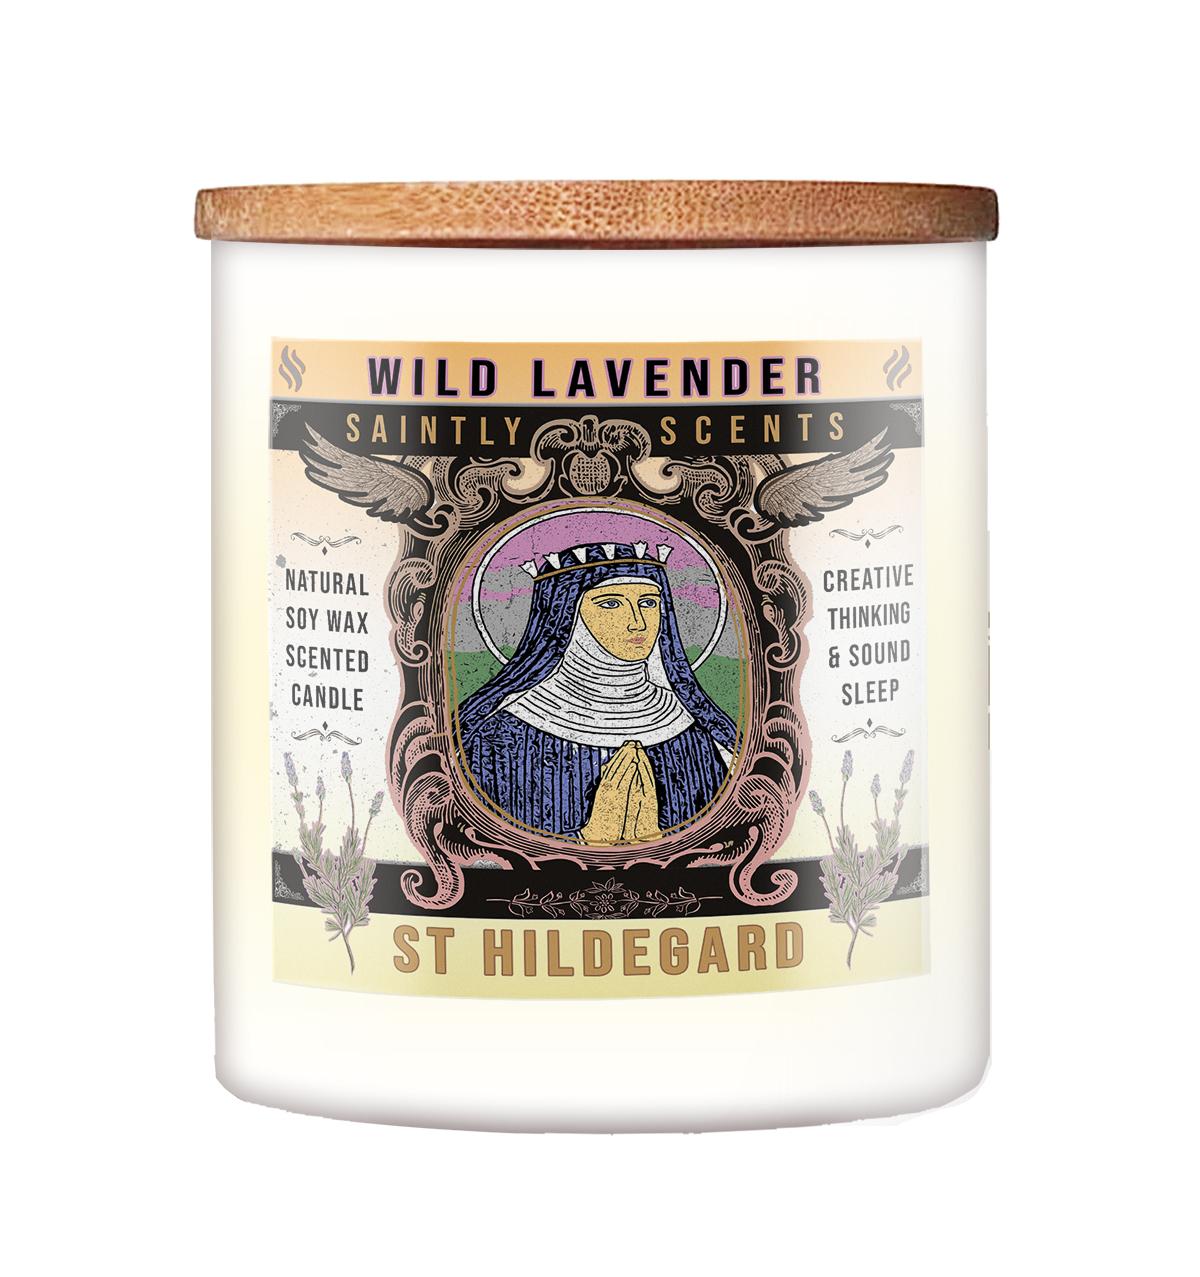 St Hildegard Lavender Scented Candle